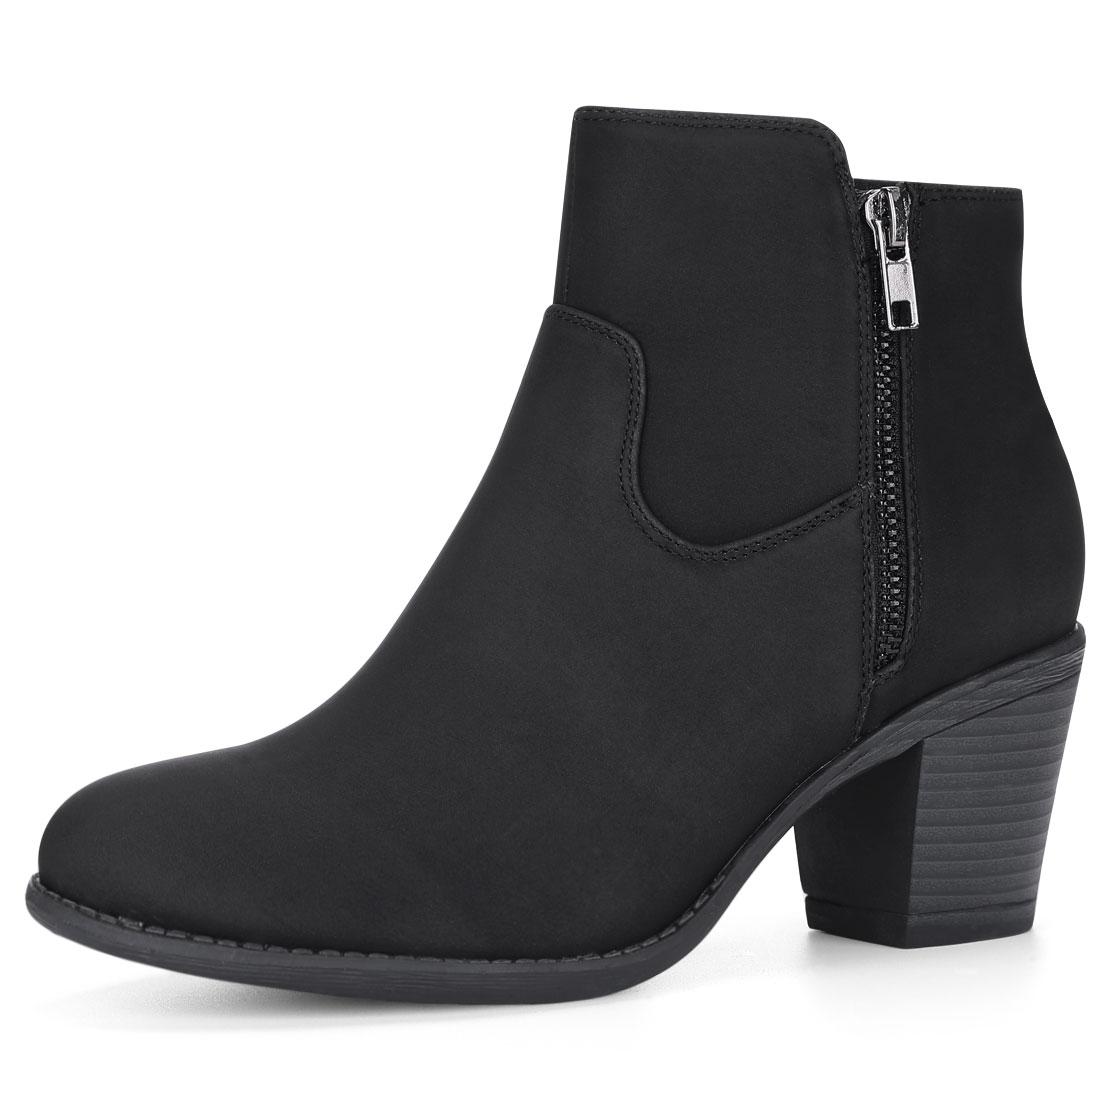 Allegra K Women Round Toe Stacked Chunky Heel Zipper Ankle Boots Black US 6